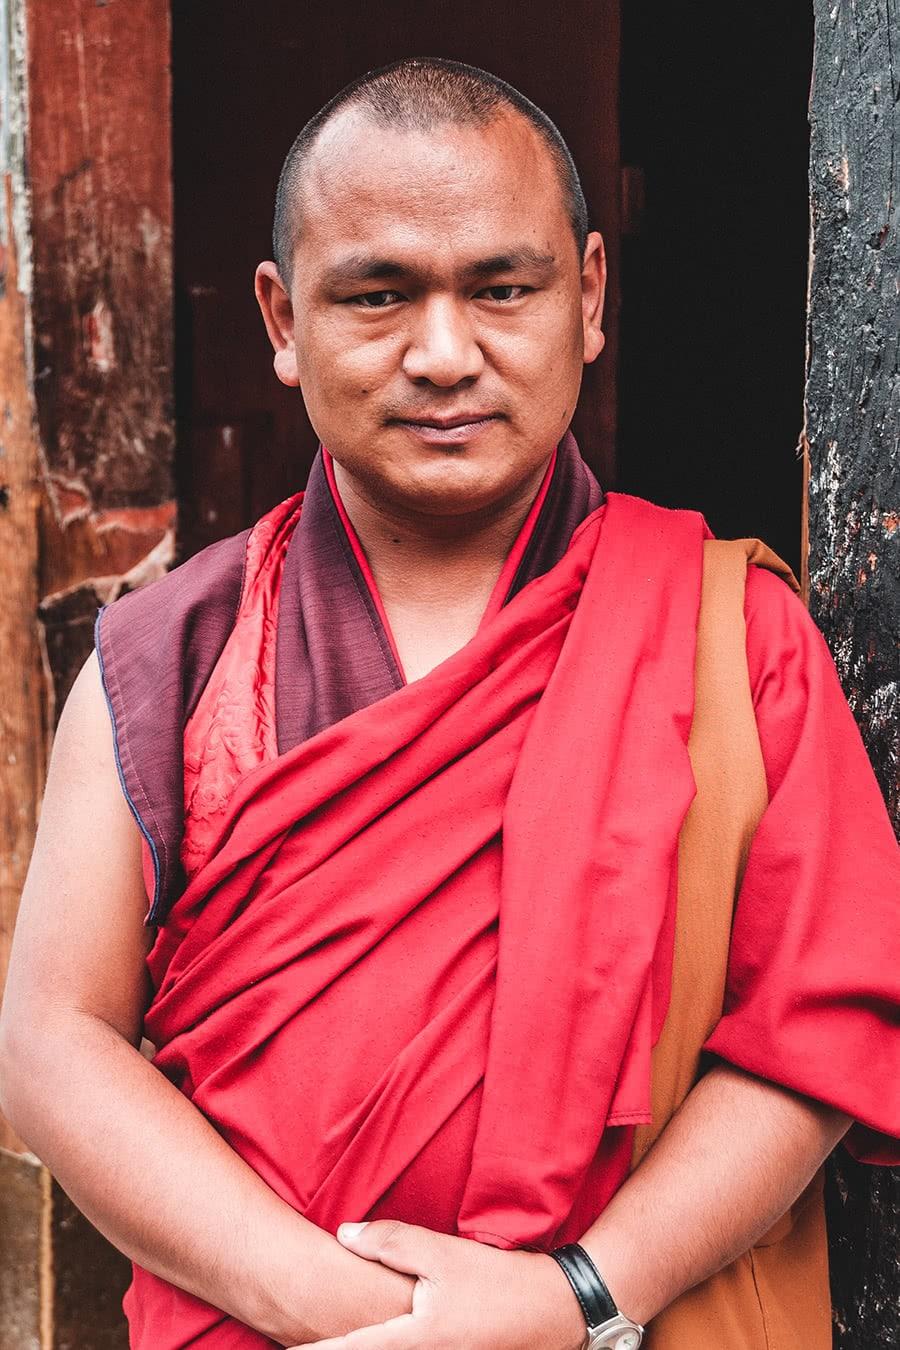 Buddhist monk at his monastery in Thimphu, Bhutan.